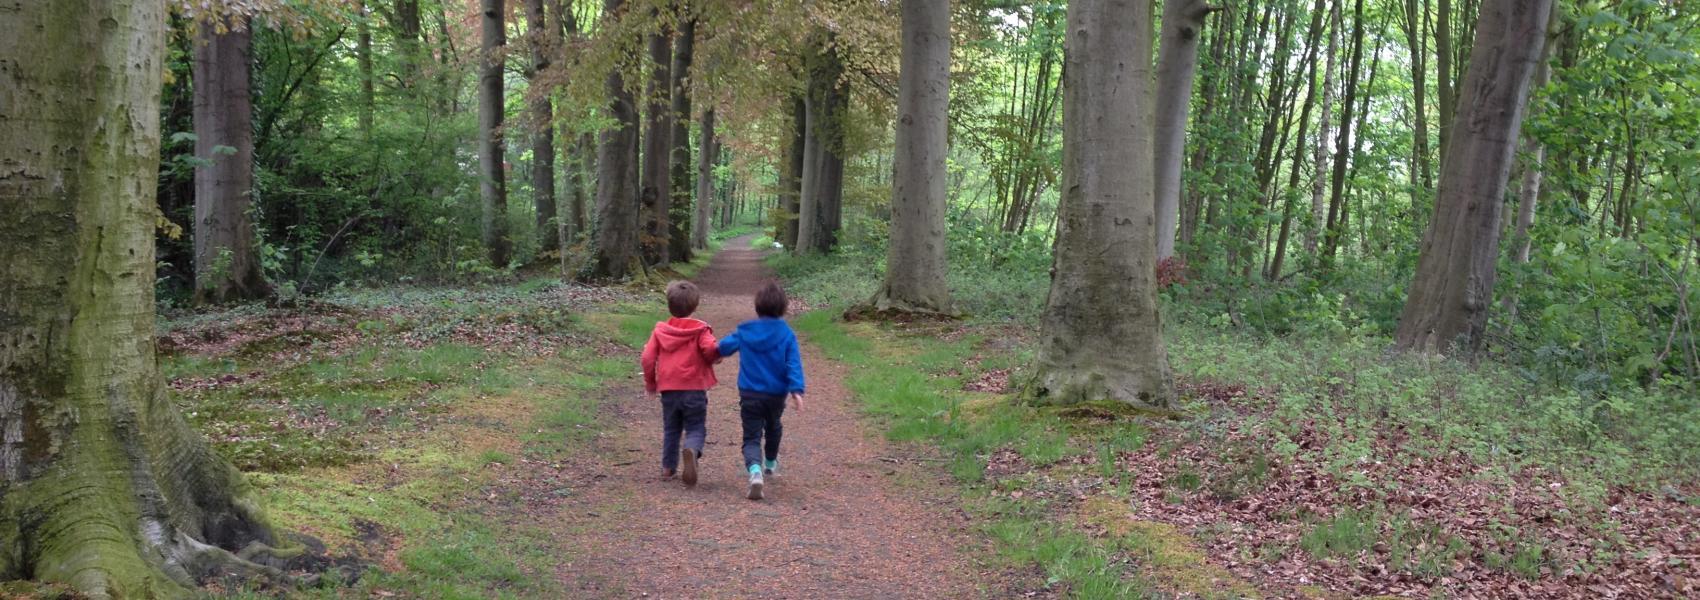 Beukendreef Vinderhoutse bossen - Griet Buyse